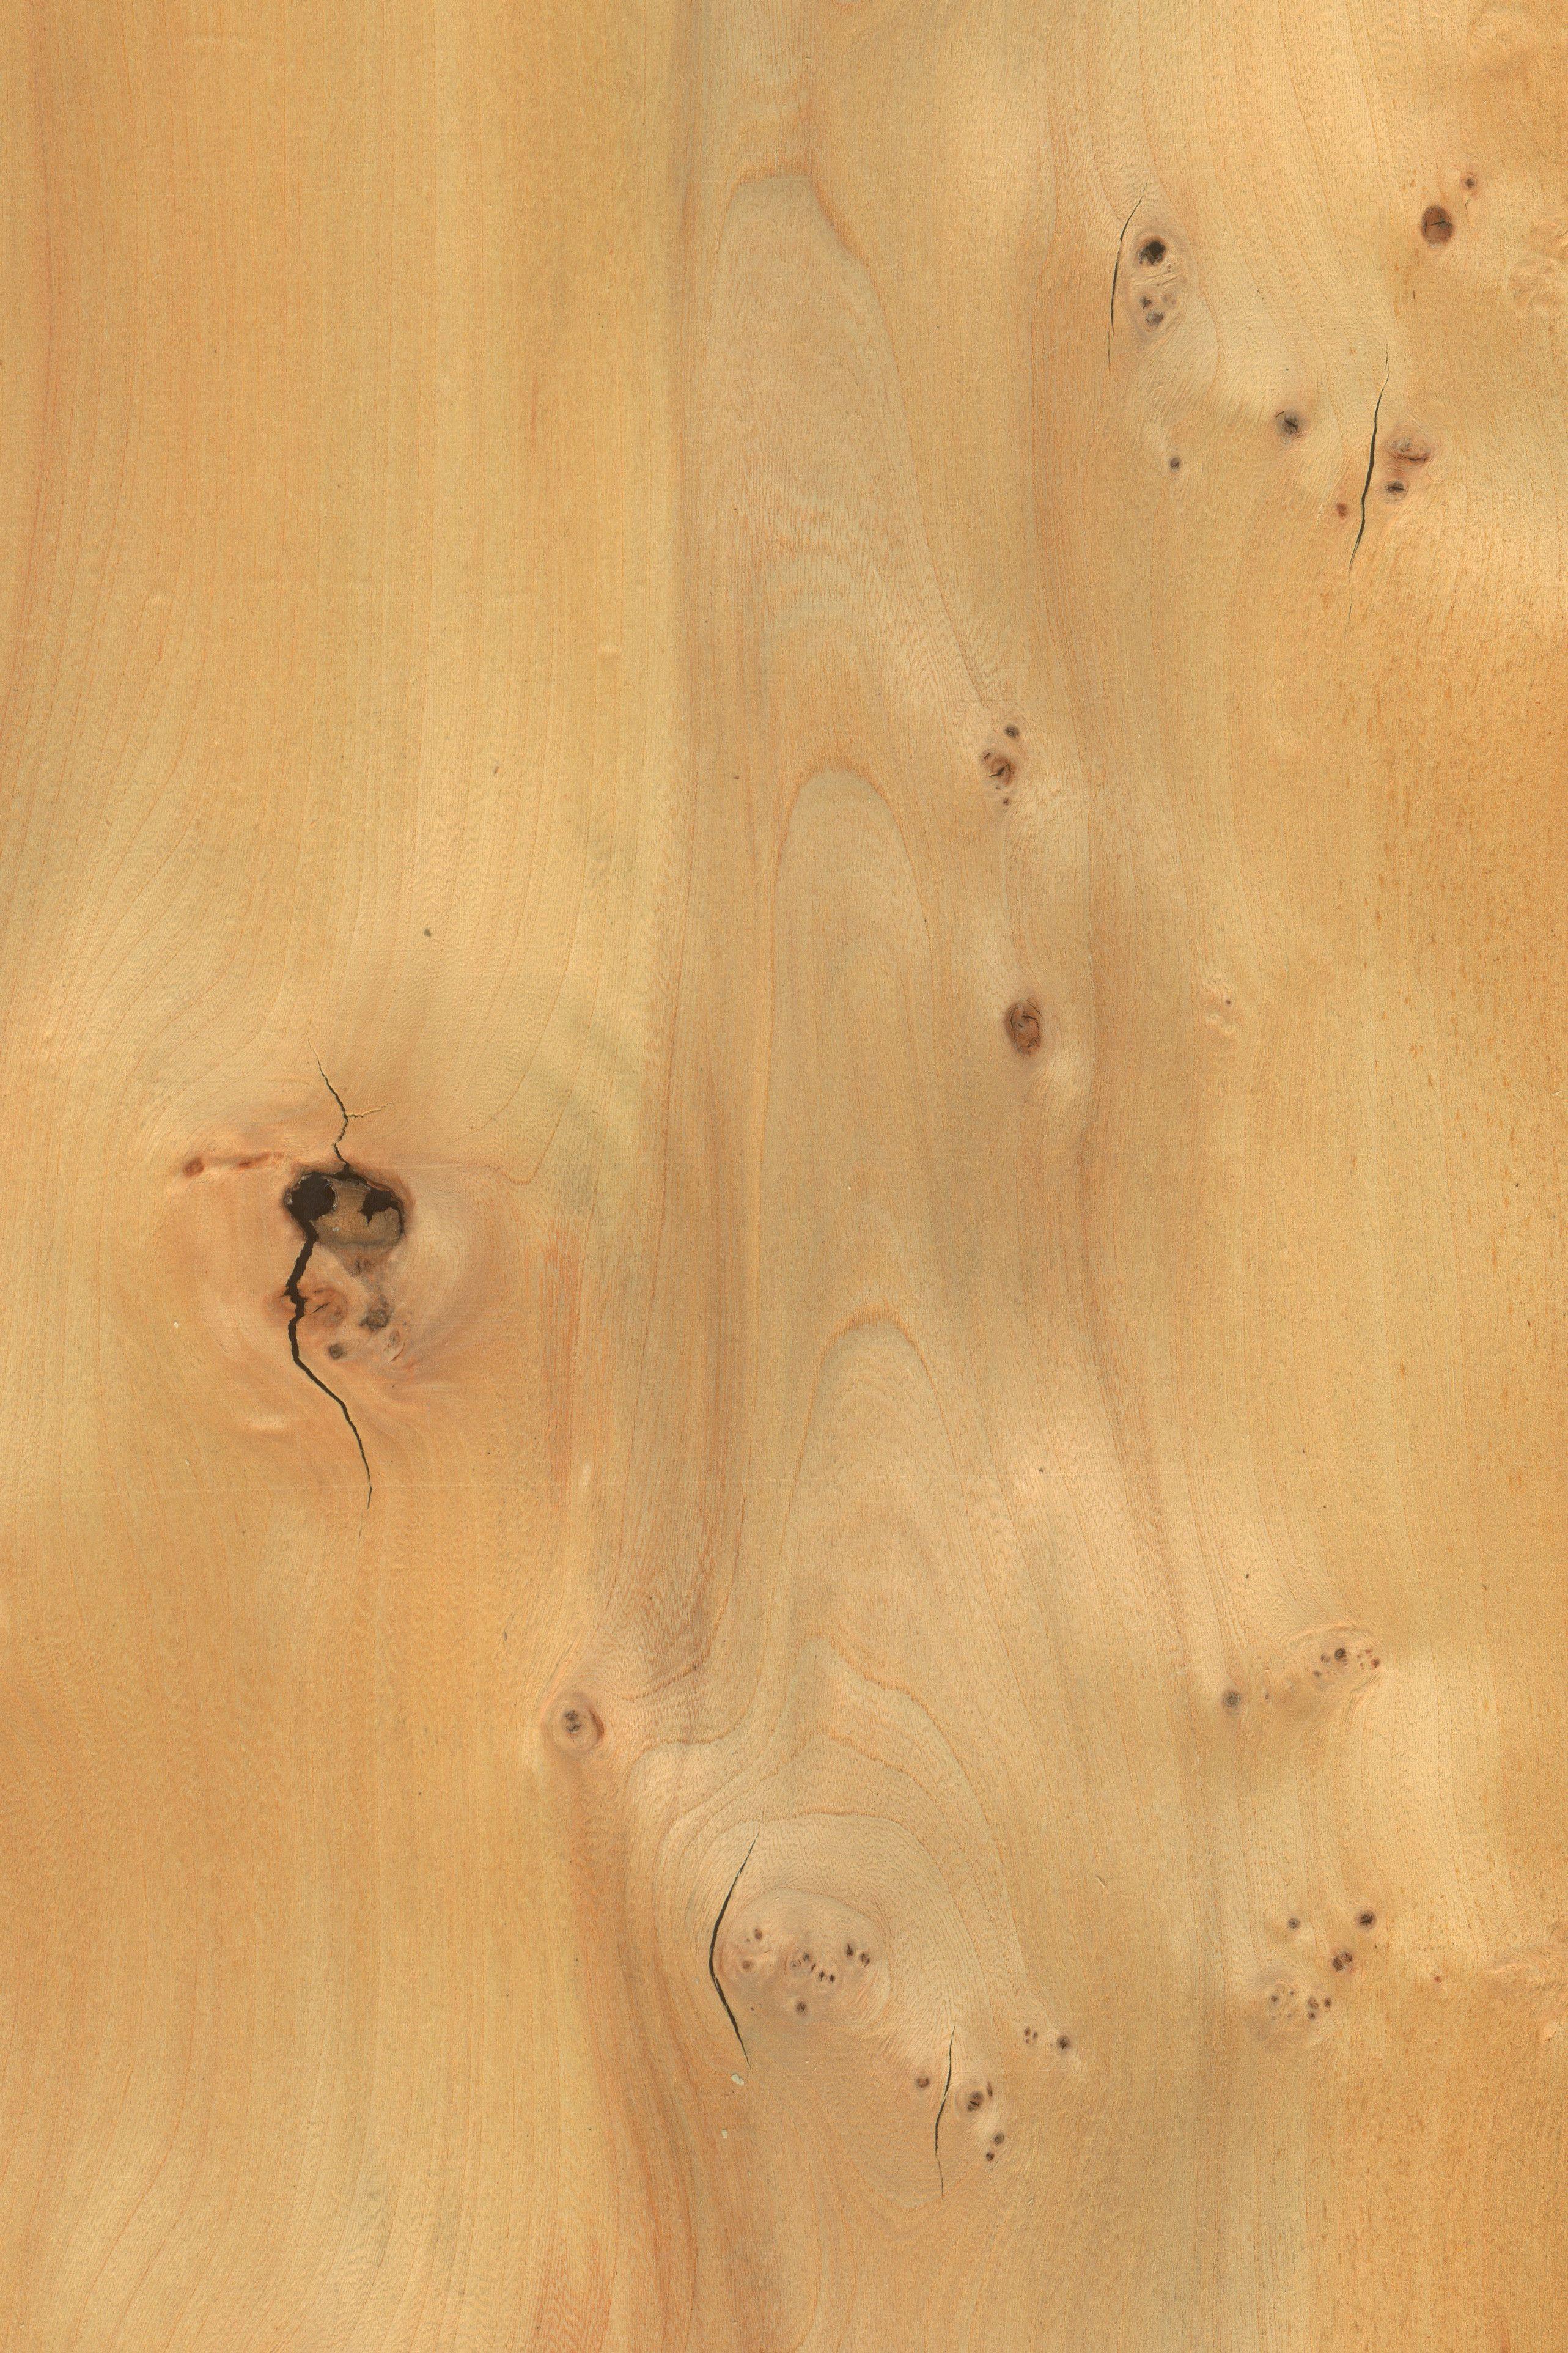 Rüster Holz rüster maser furnier holzart robinie blatt hell braun